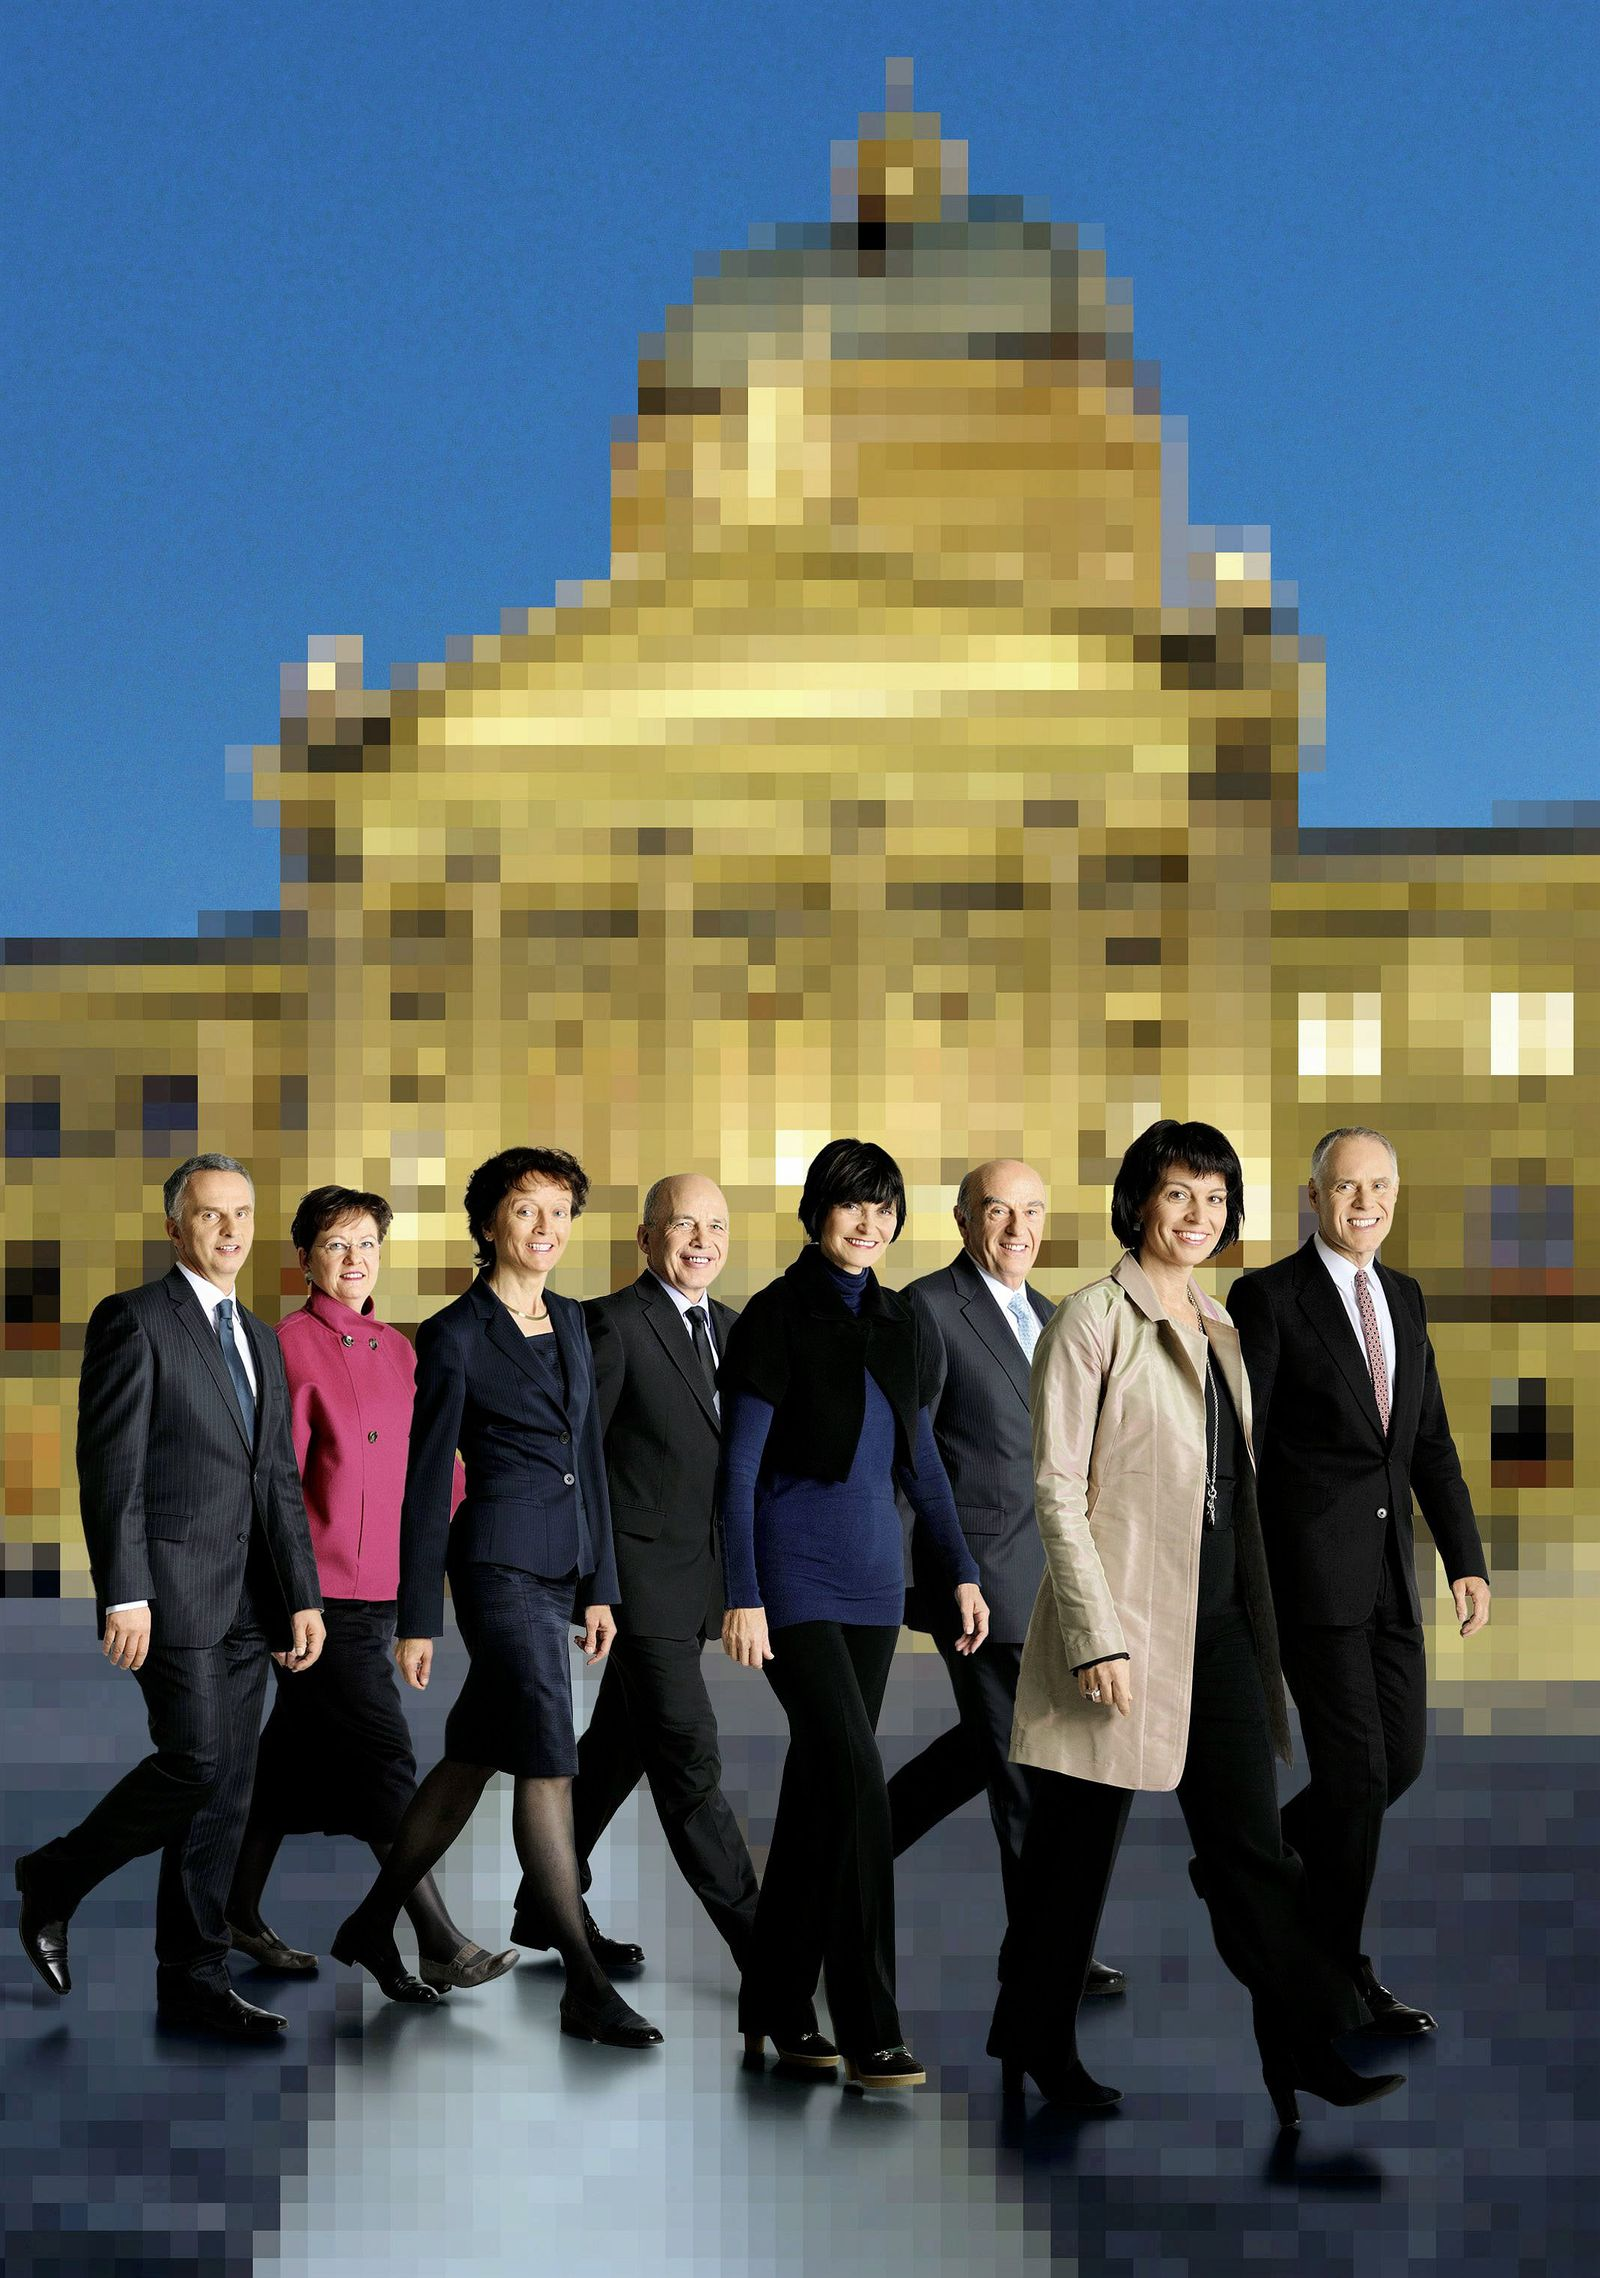 Offizielles Foto Schweizer Bundesrat